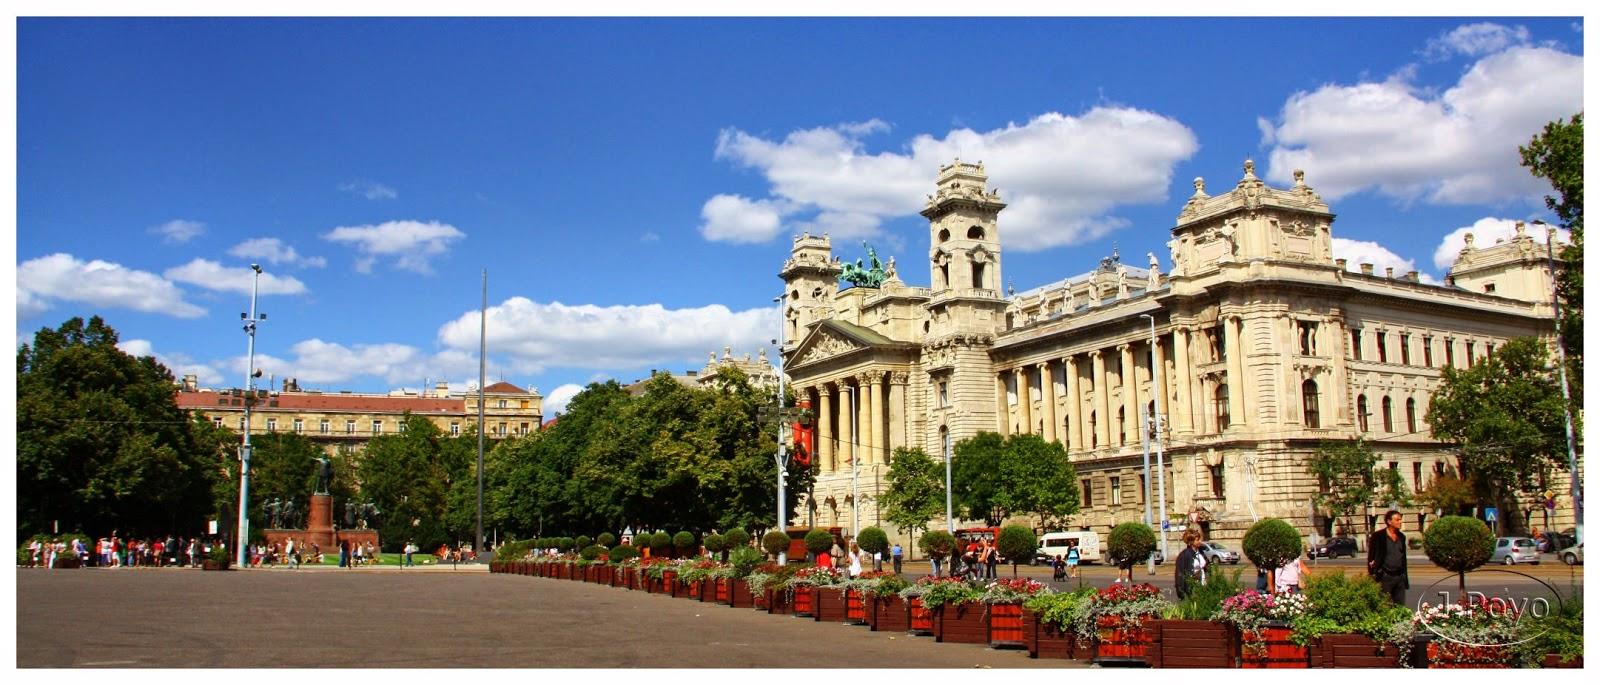 Museo Etnográfico frente al Parlamento de Budapest